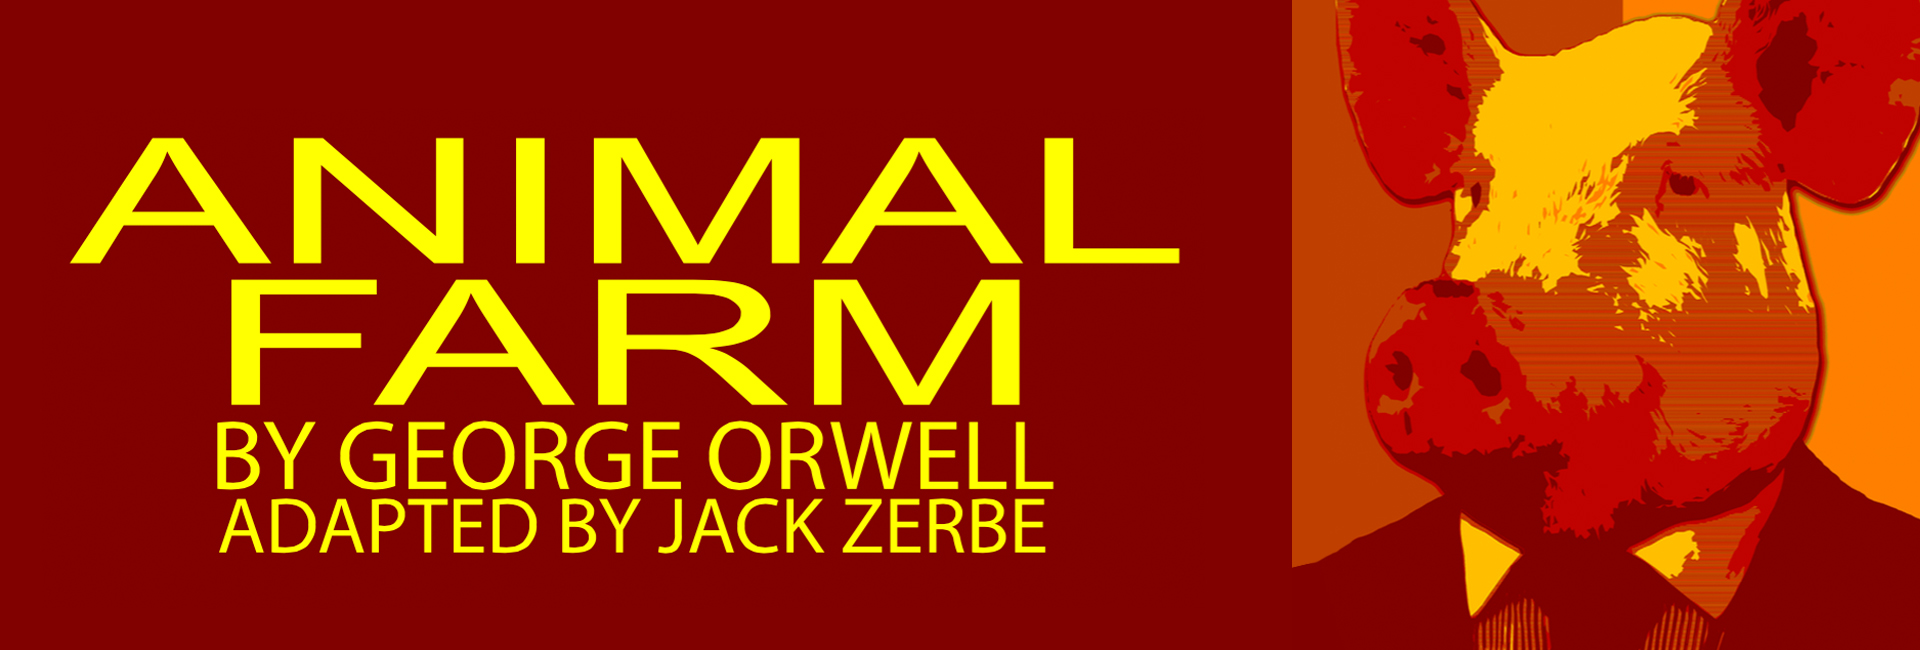 Animal farm newspaper